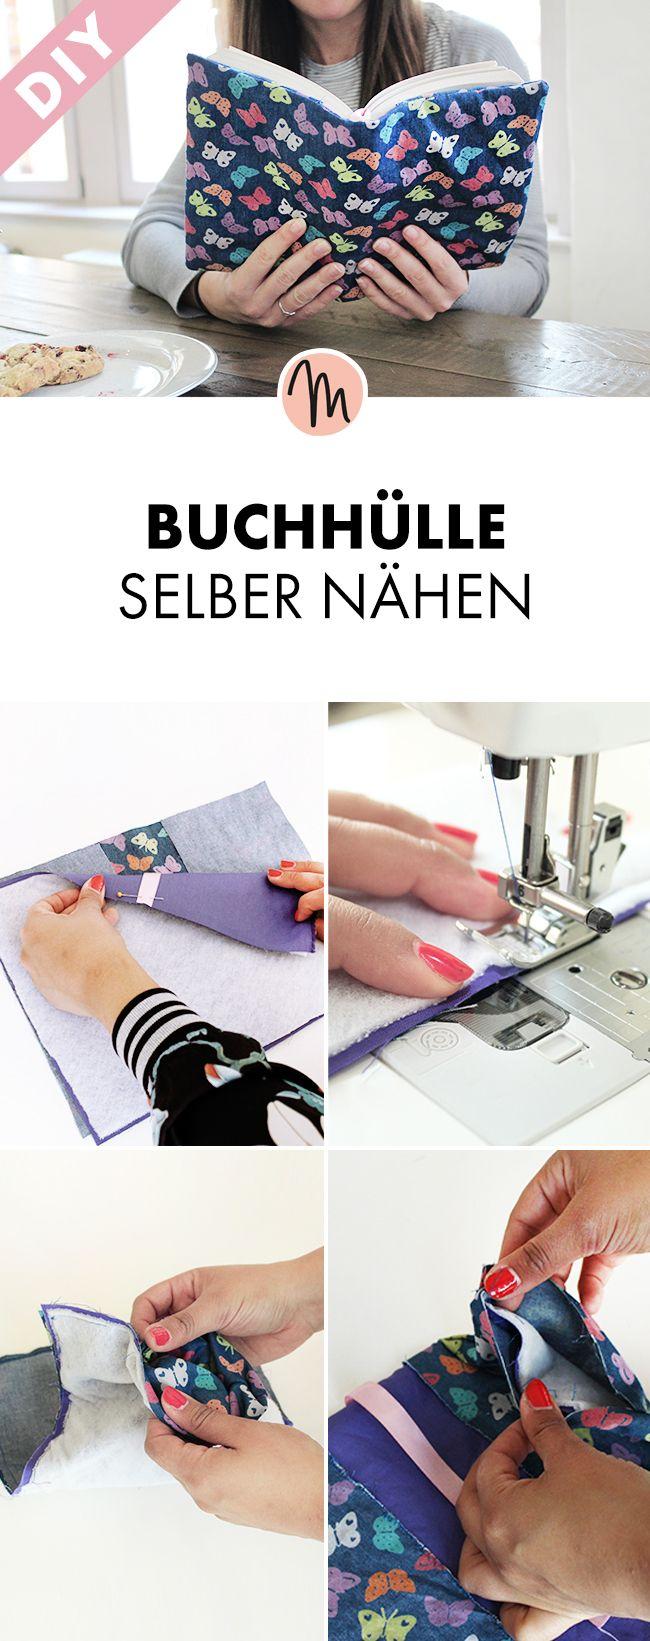 Photo of Buchhülle selber nähen – Näh-Anleitung via Makerist.de